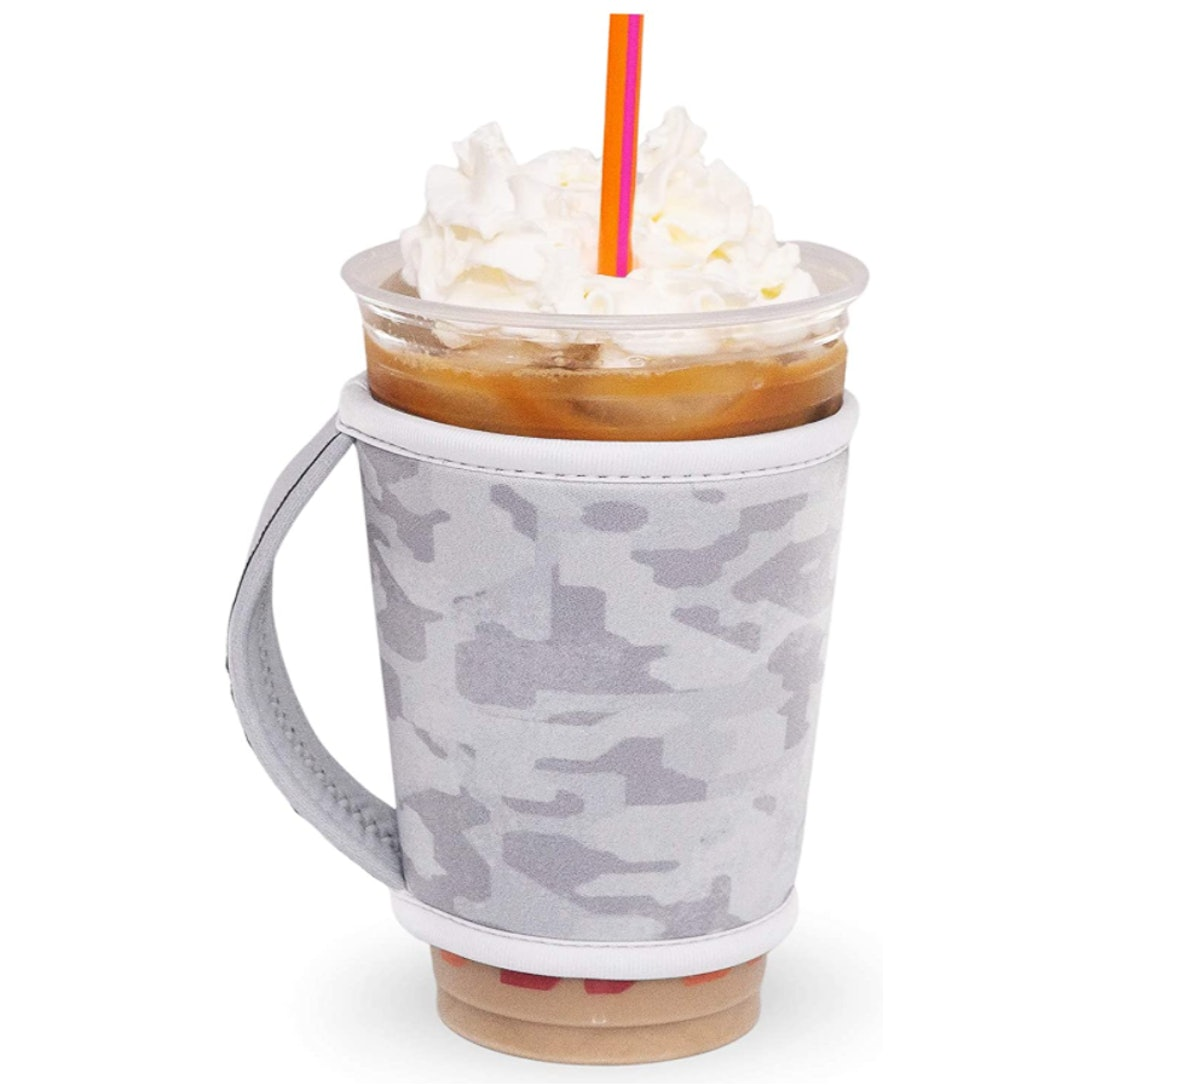 GoCuff Reusable Coffee Cup Insulator Sleeve with Handle